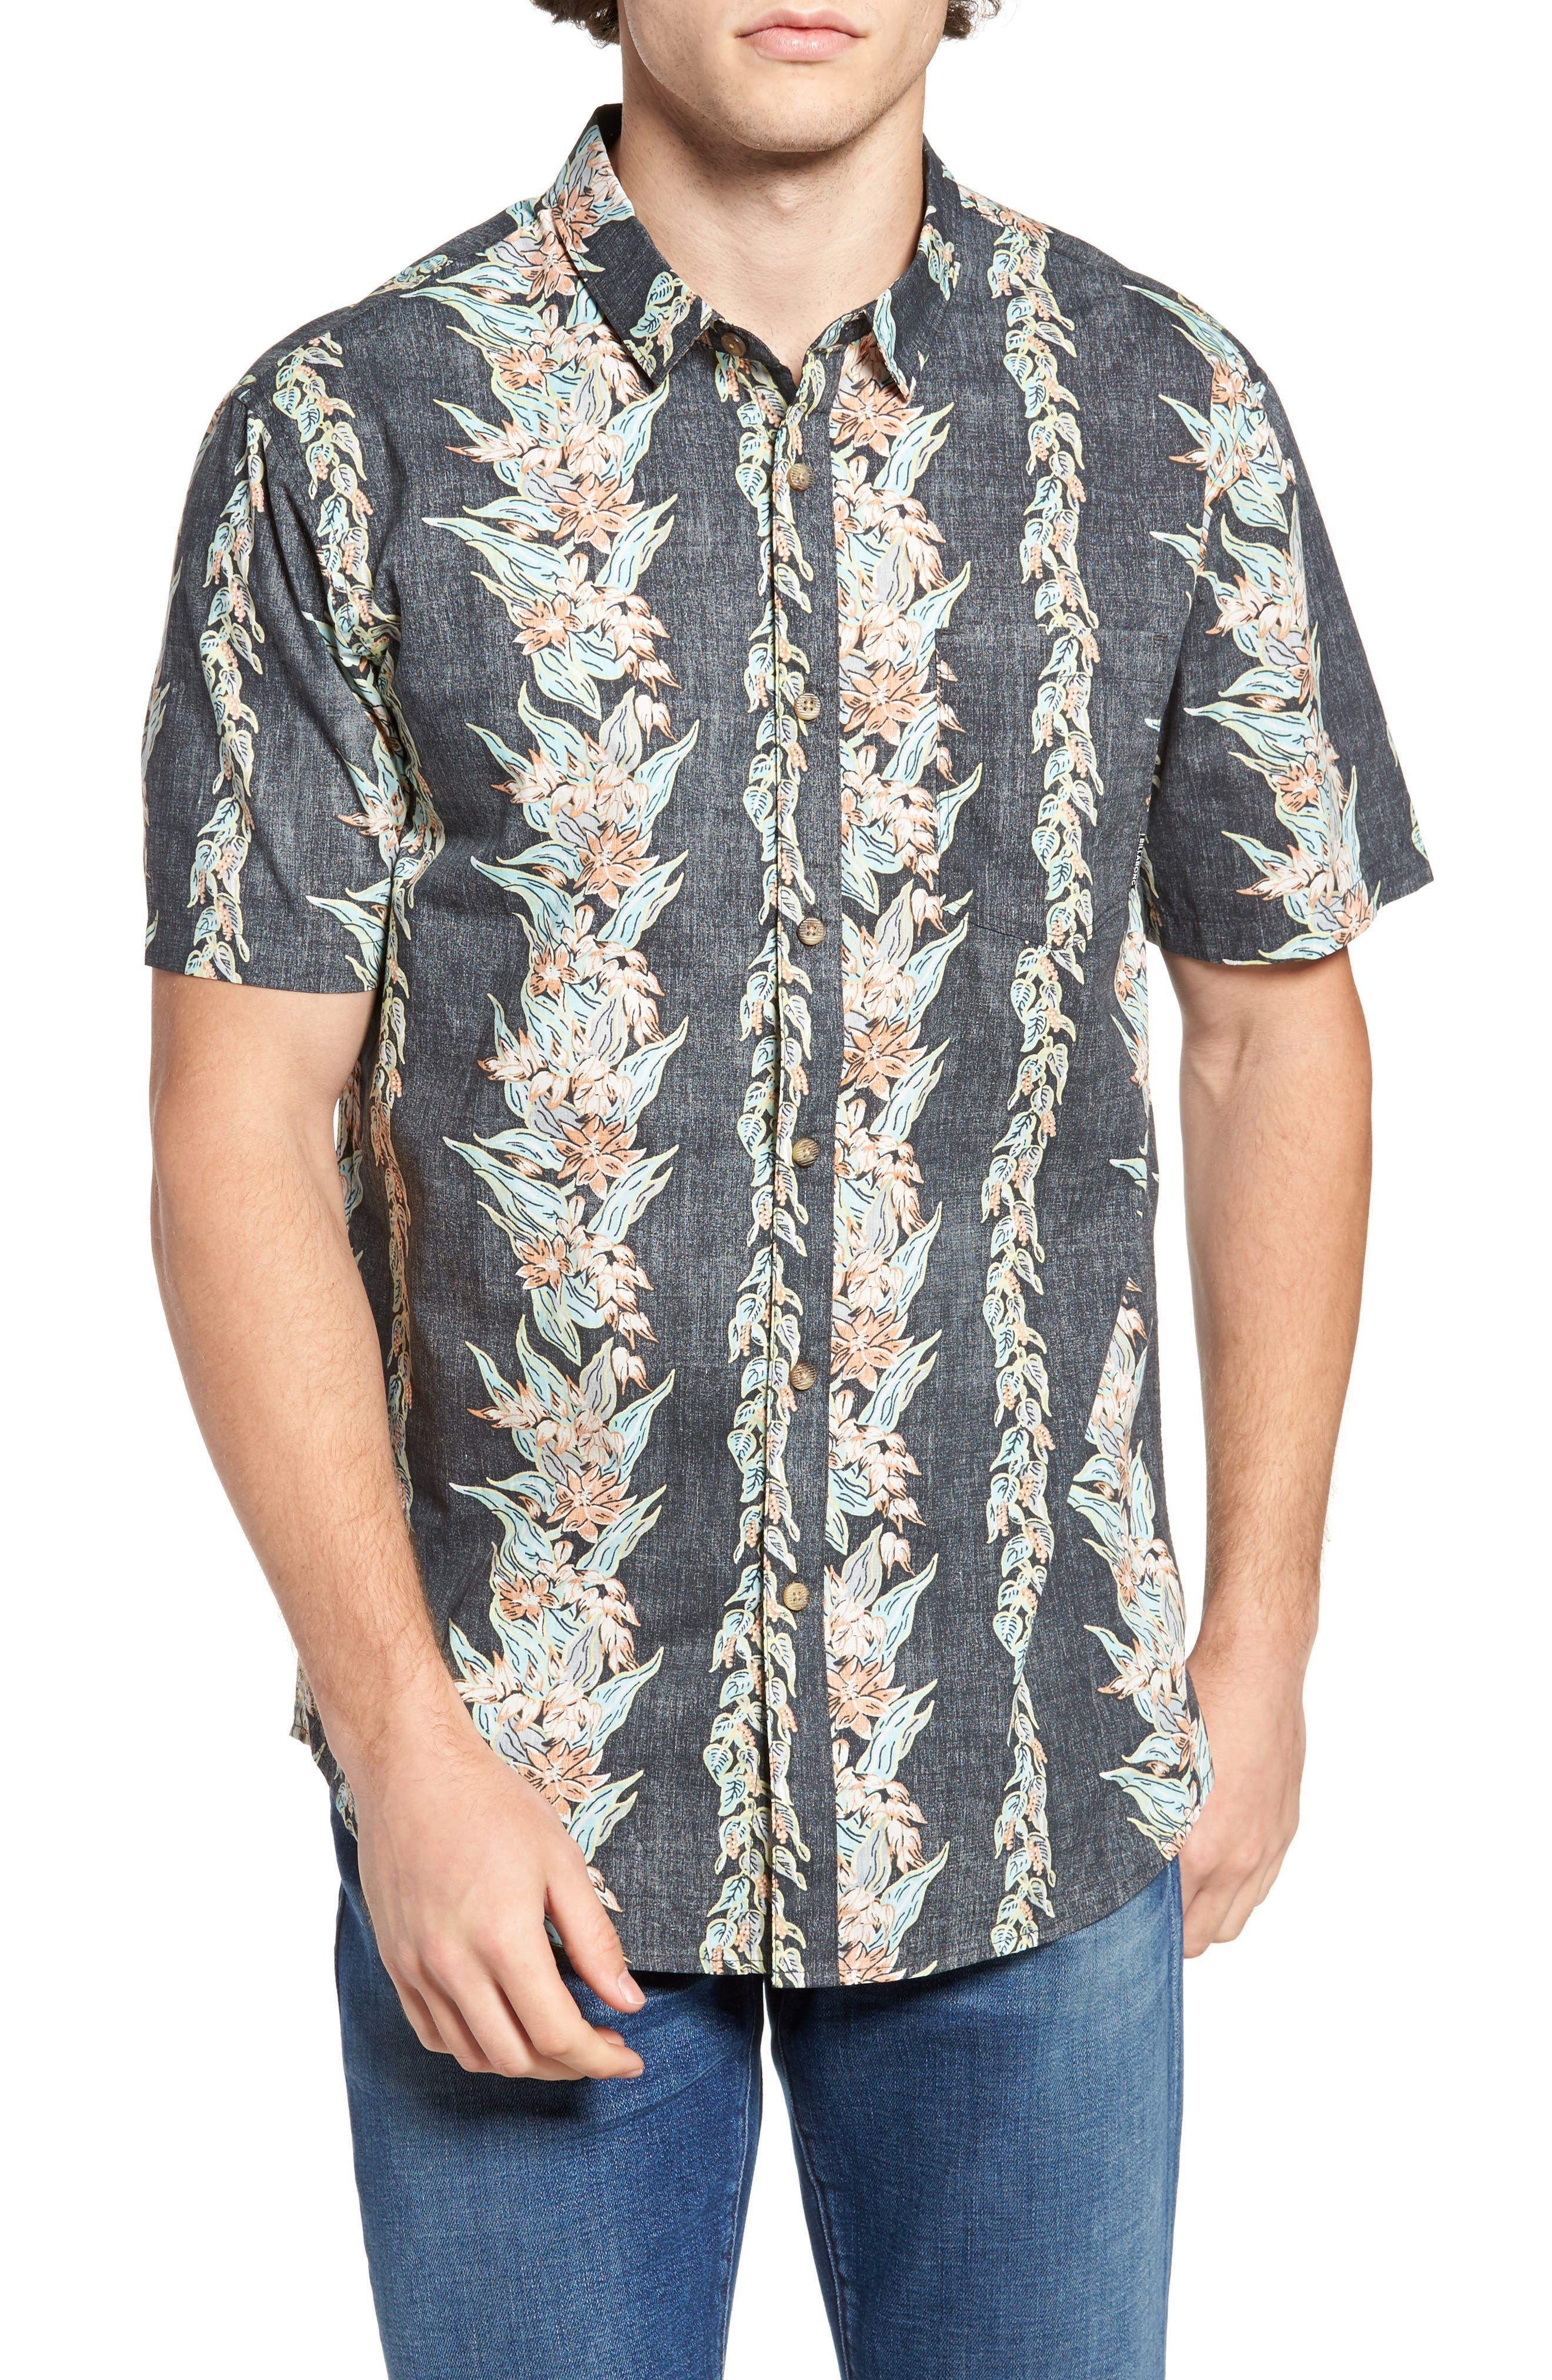 Alternate Image 1 Selected - Billabong Sundays Floral Woven Shirt